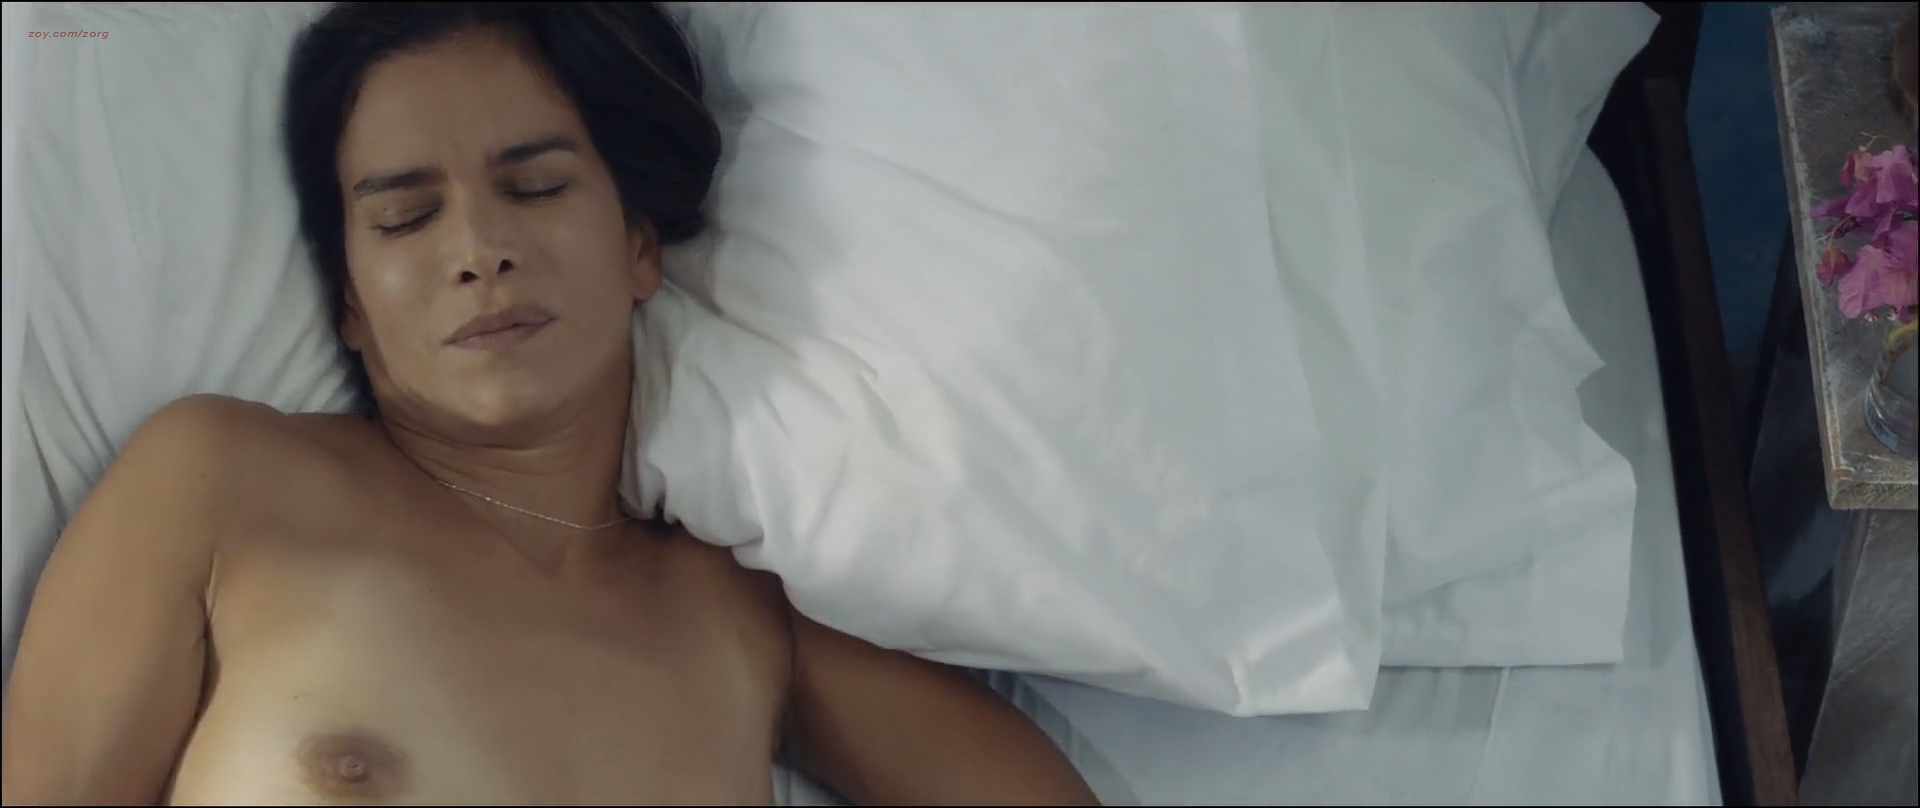 Anja Ali Samantha Lesbian Porn patricia velásquez nude topless, lesbian sex and eloisa